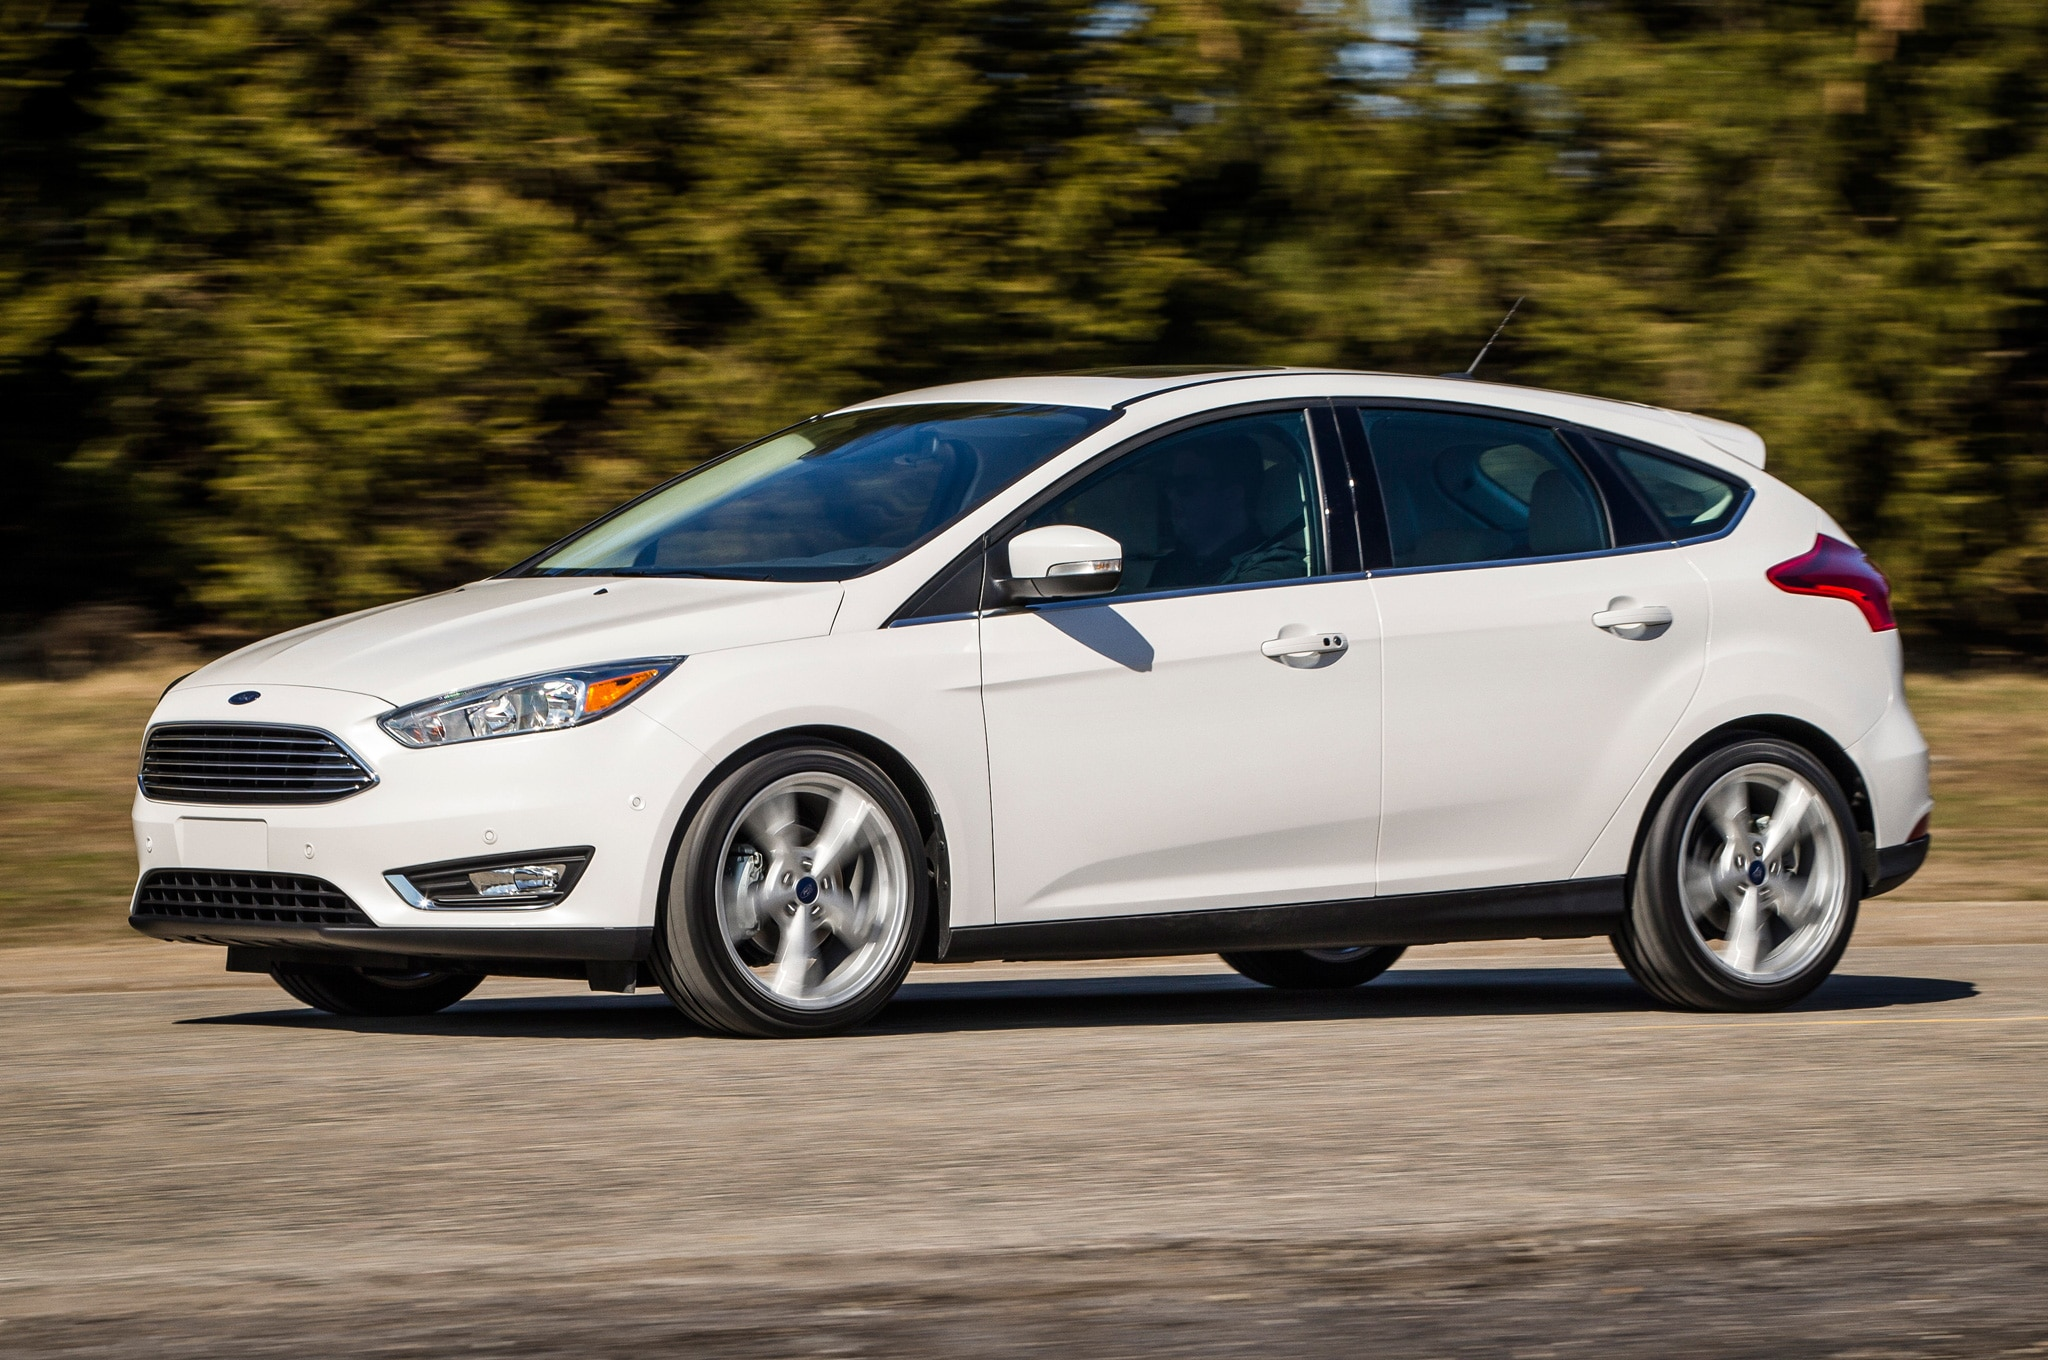 2015 ford focus hatchback front side motion view on road - Ford Focus 2014 Hatchback White